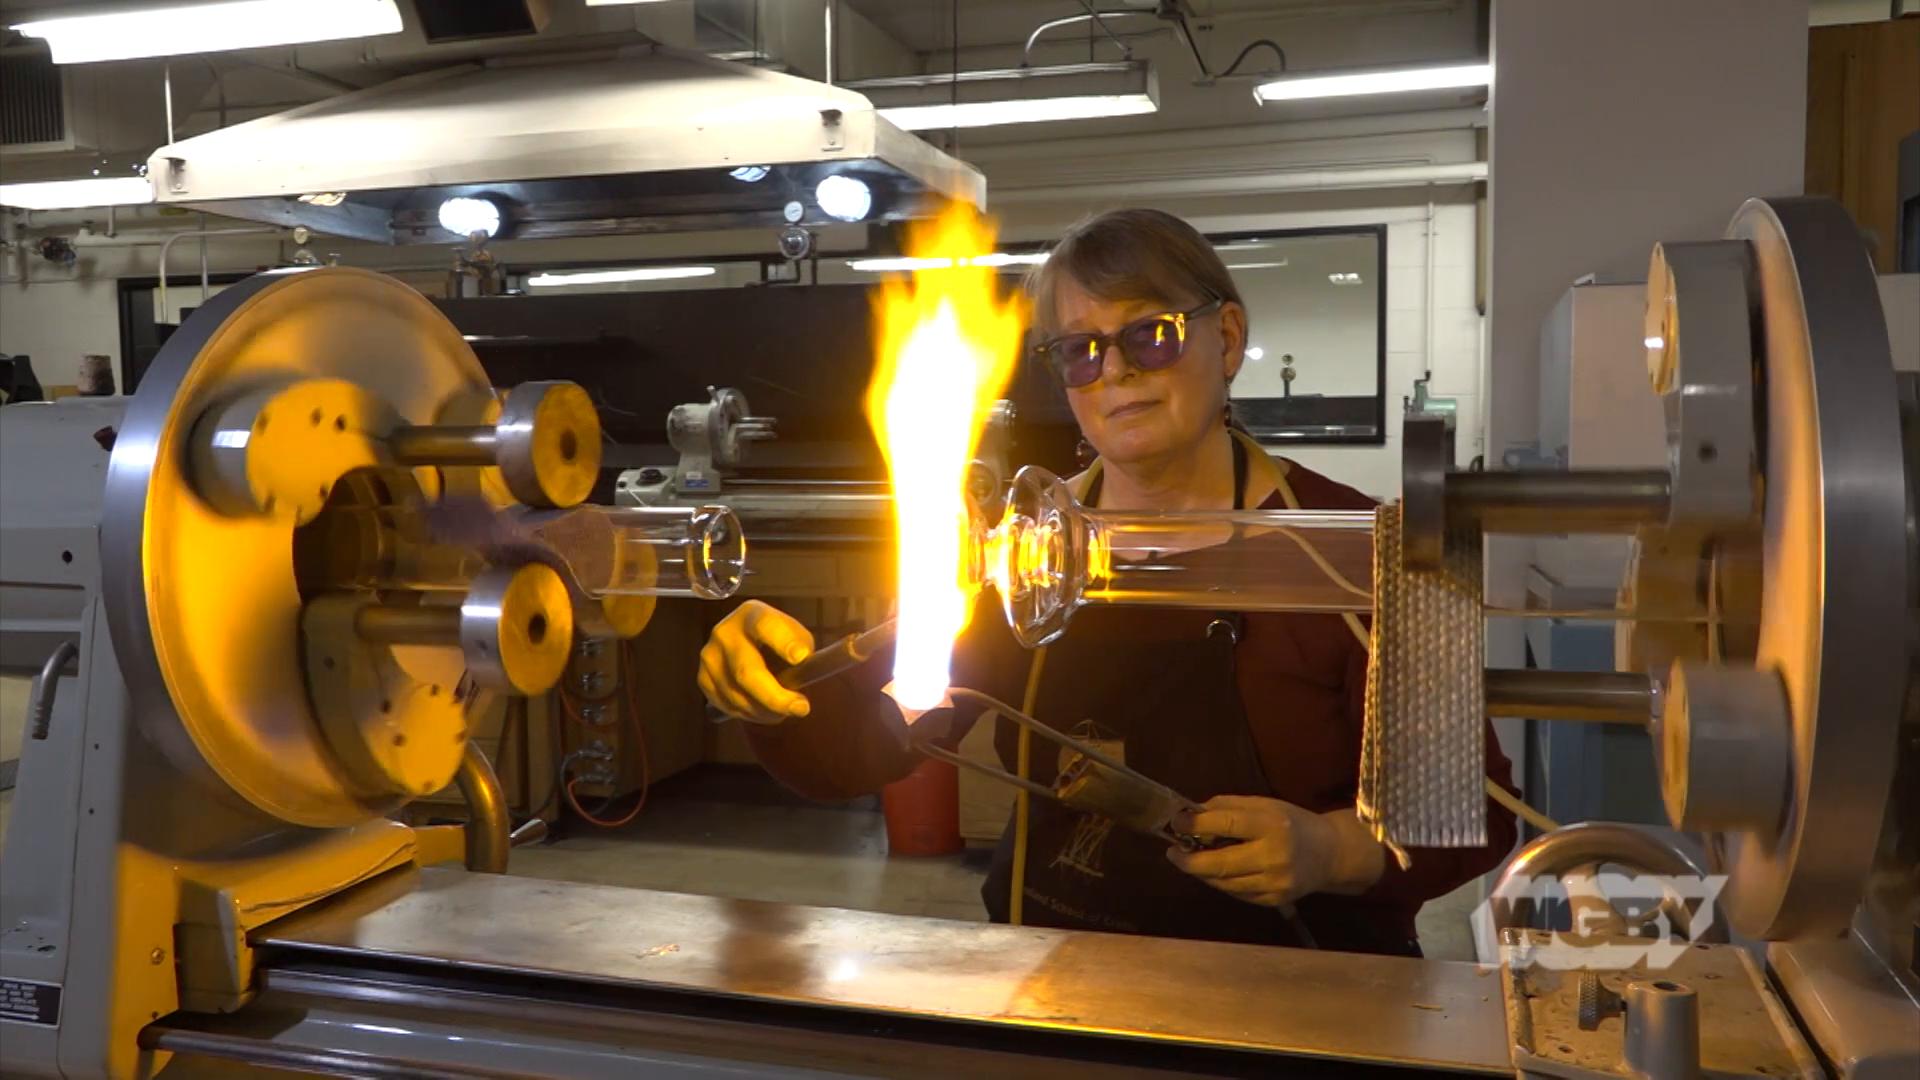 WATCH: Go inside the UMass Amherst Scientific Glassblowing Lab, where master glassblower Sally Prasch crafts custom scientific instruments for researchers.